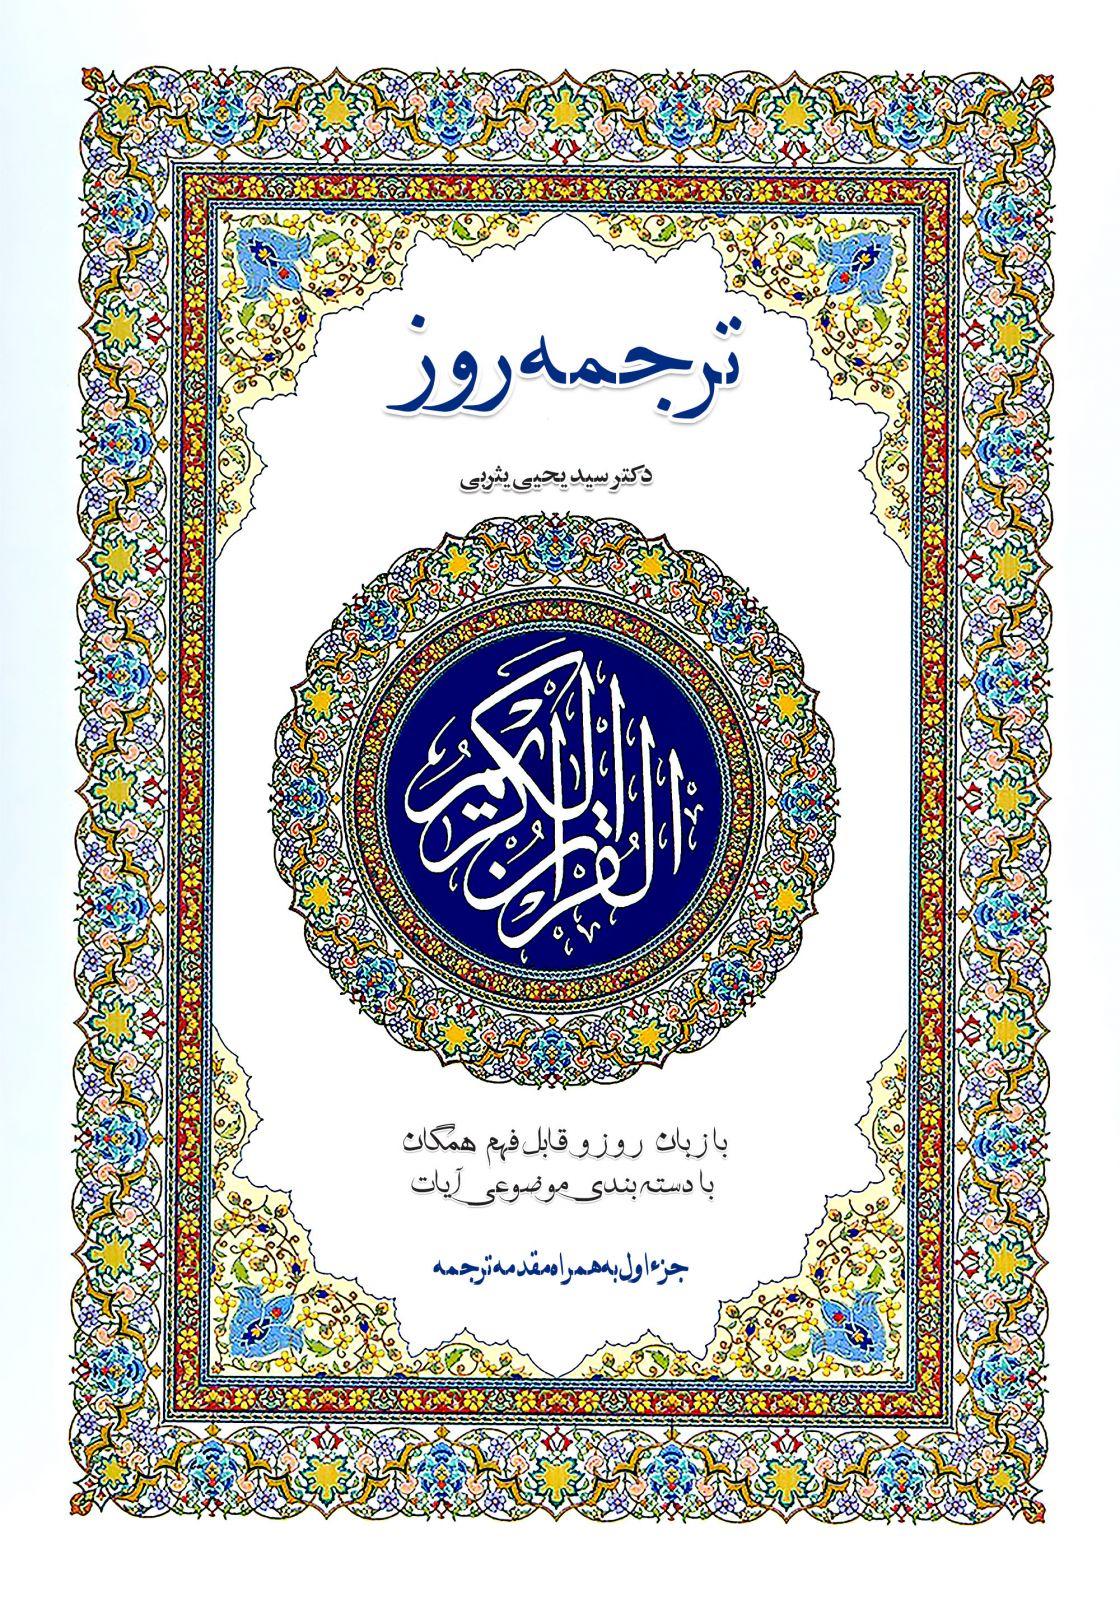 قرآن کریم (جزء اول)